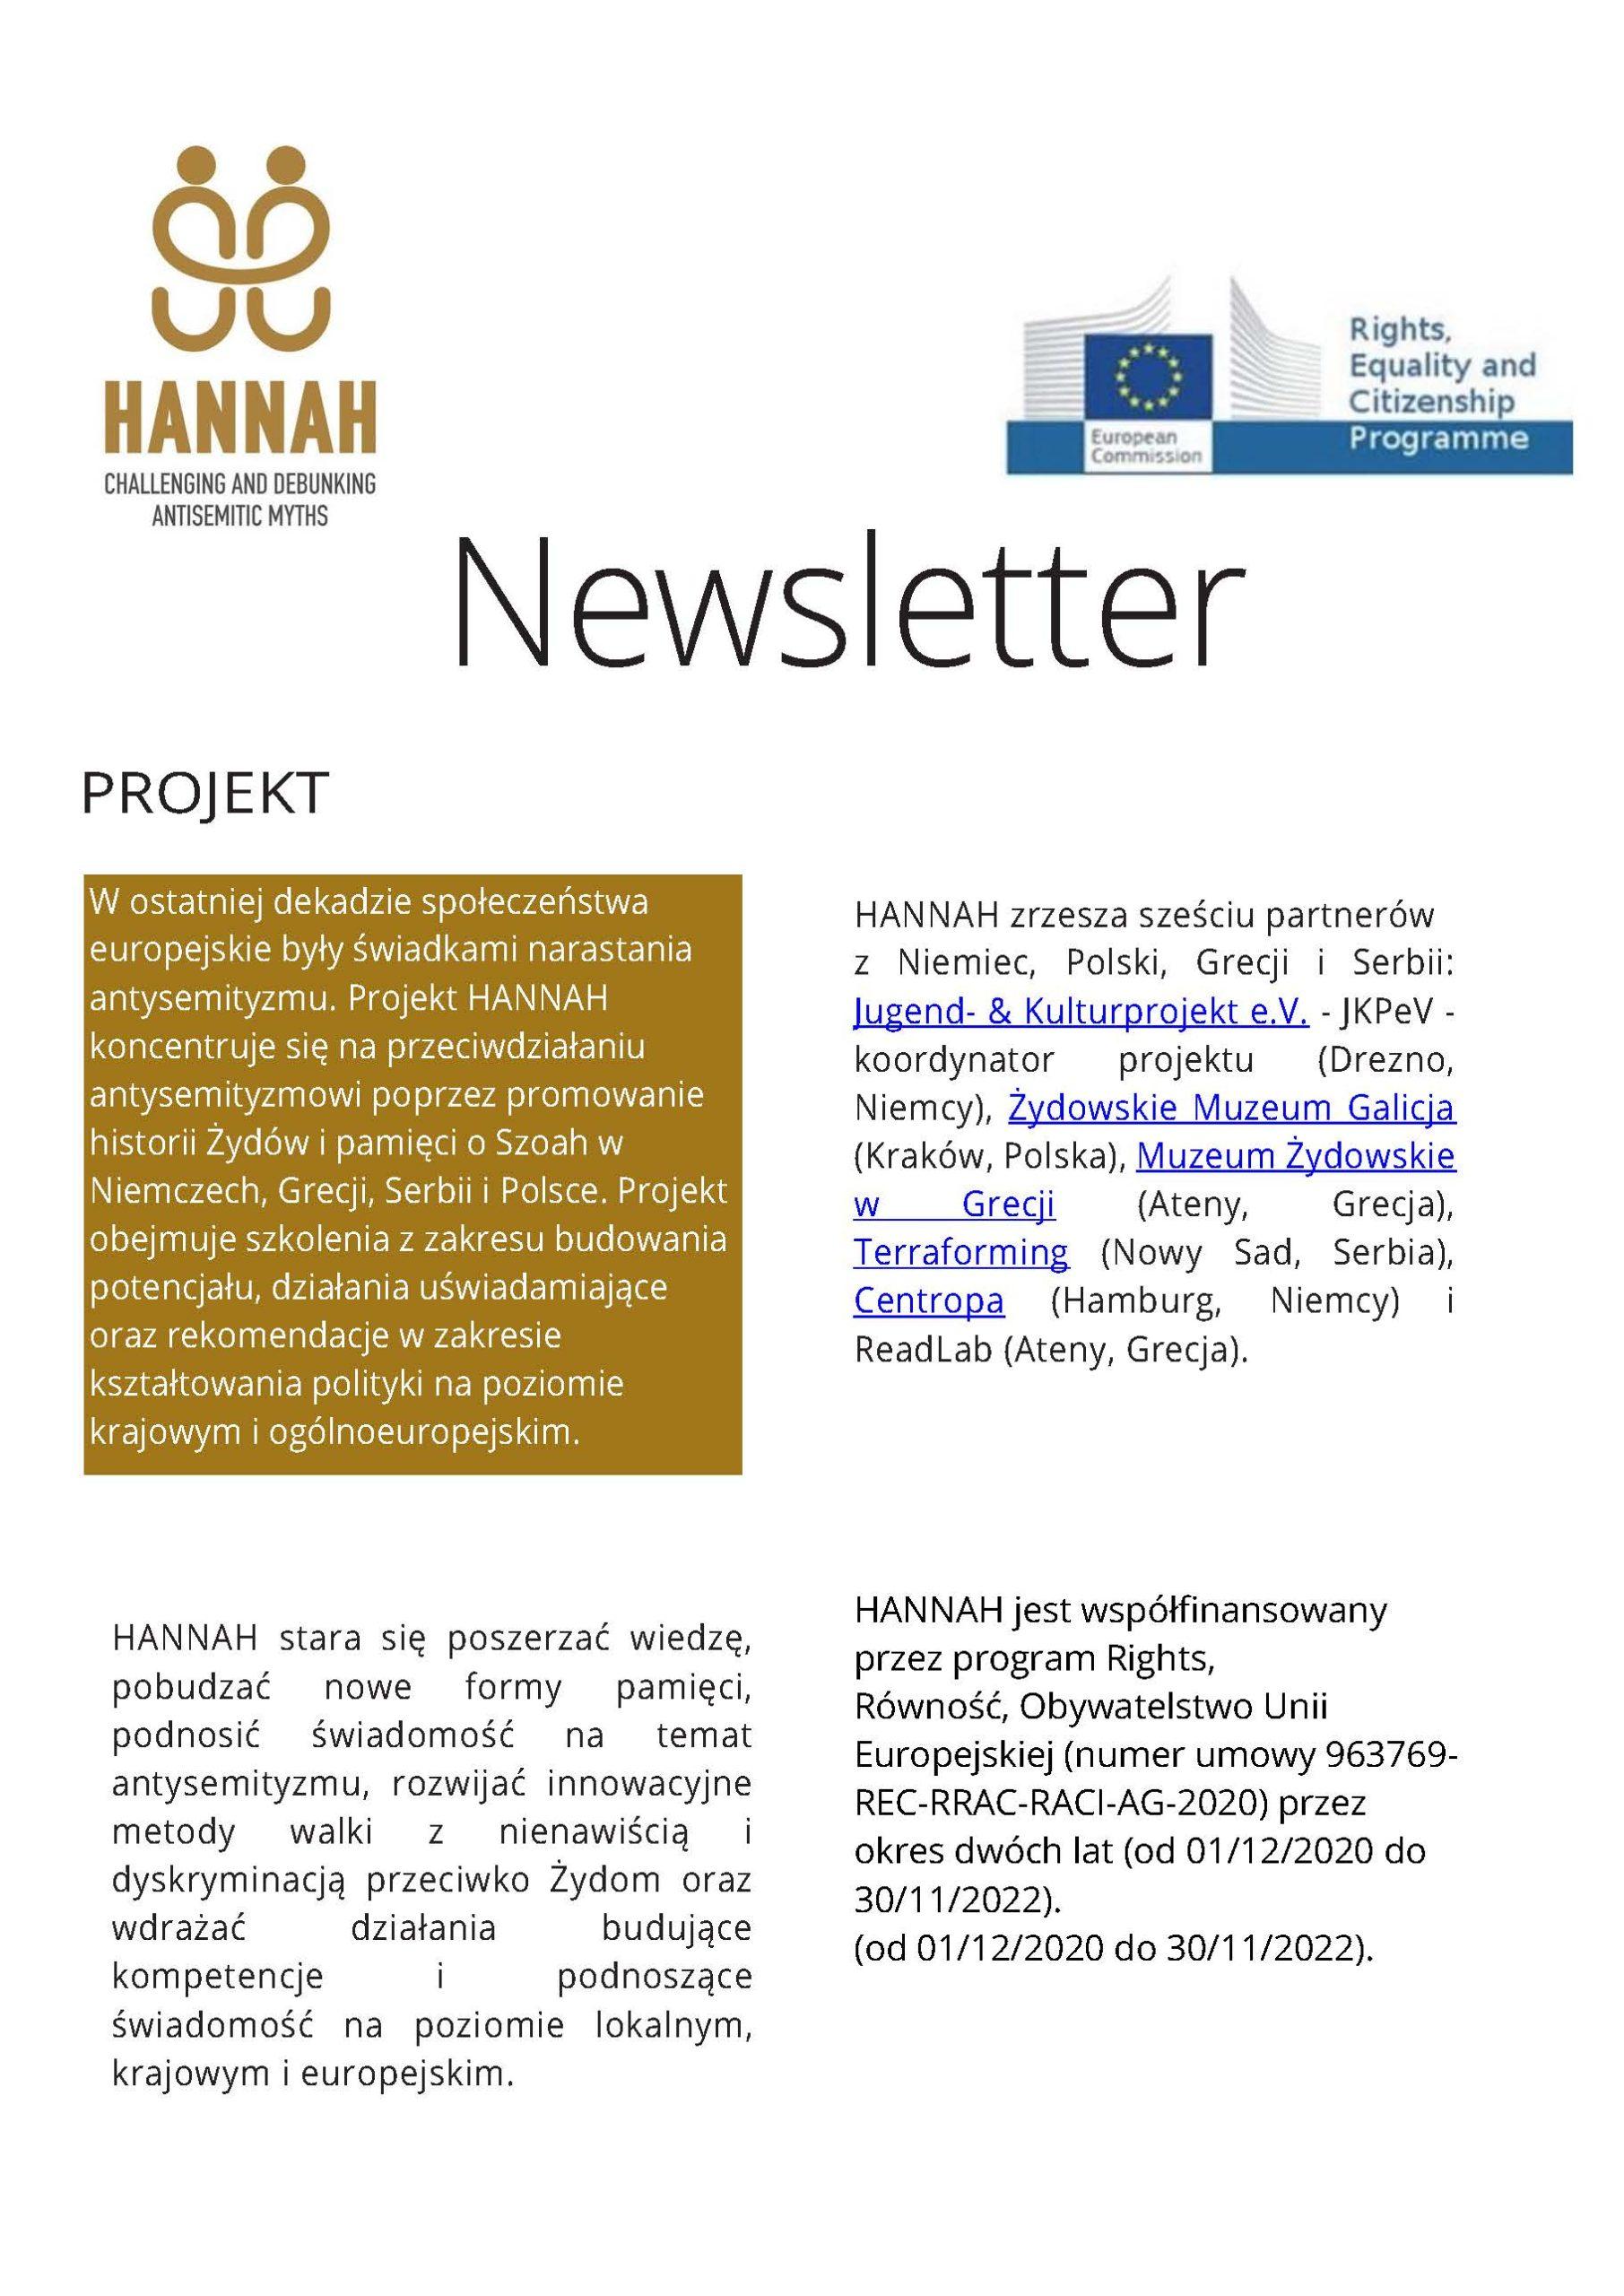 2021-10-09-hannah-1-galicja.jpg